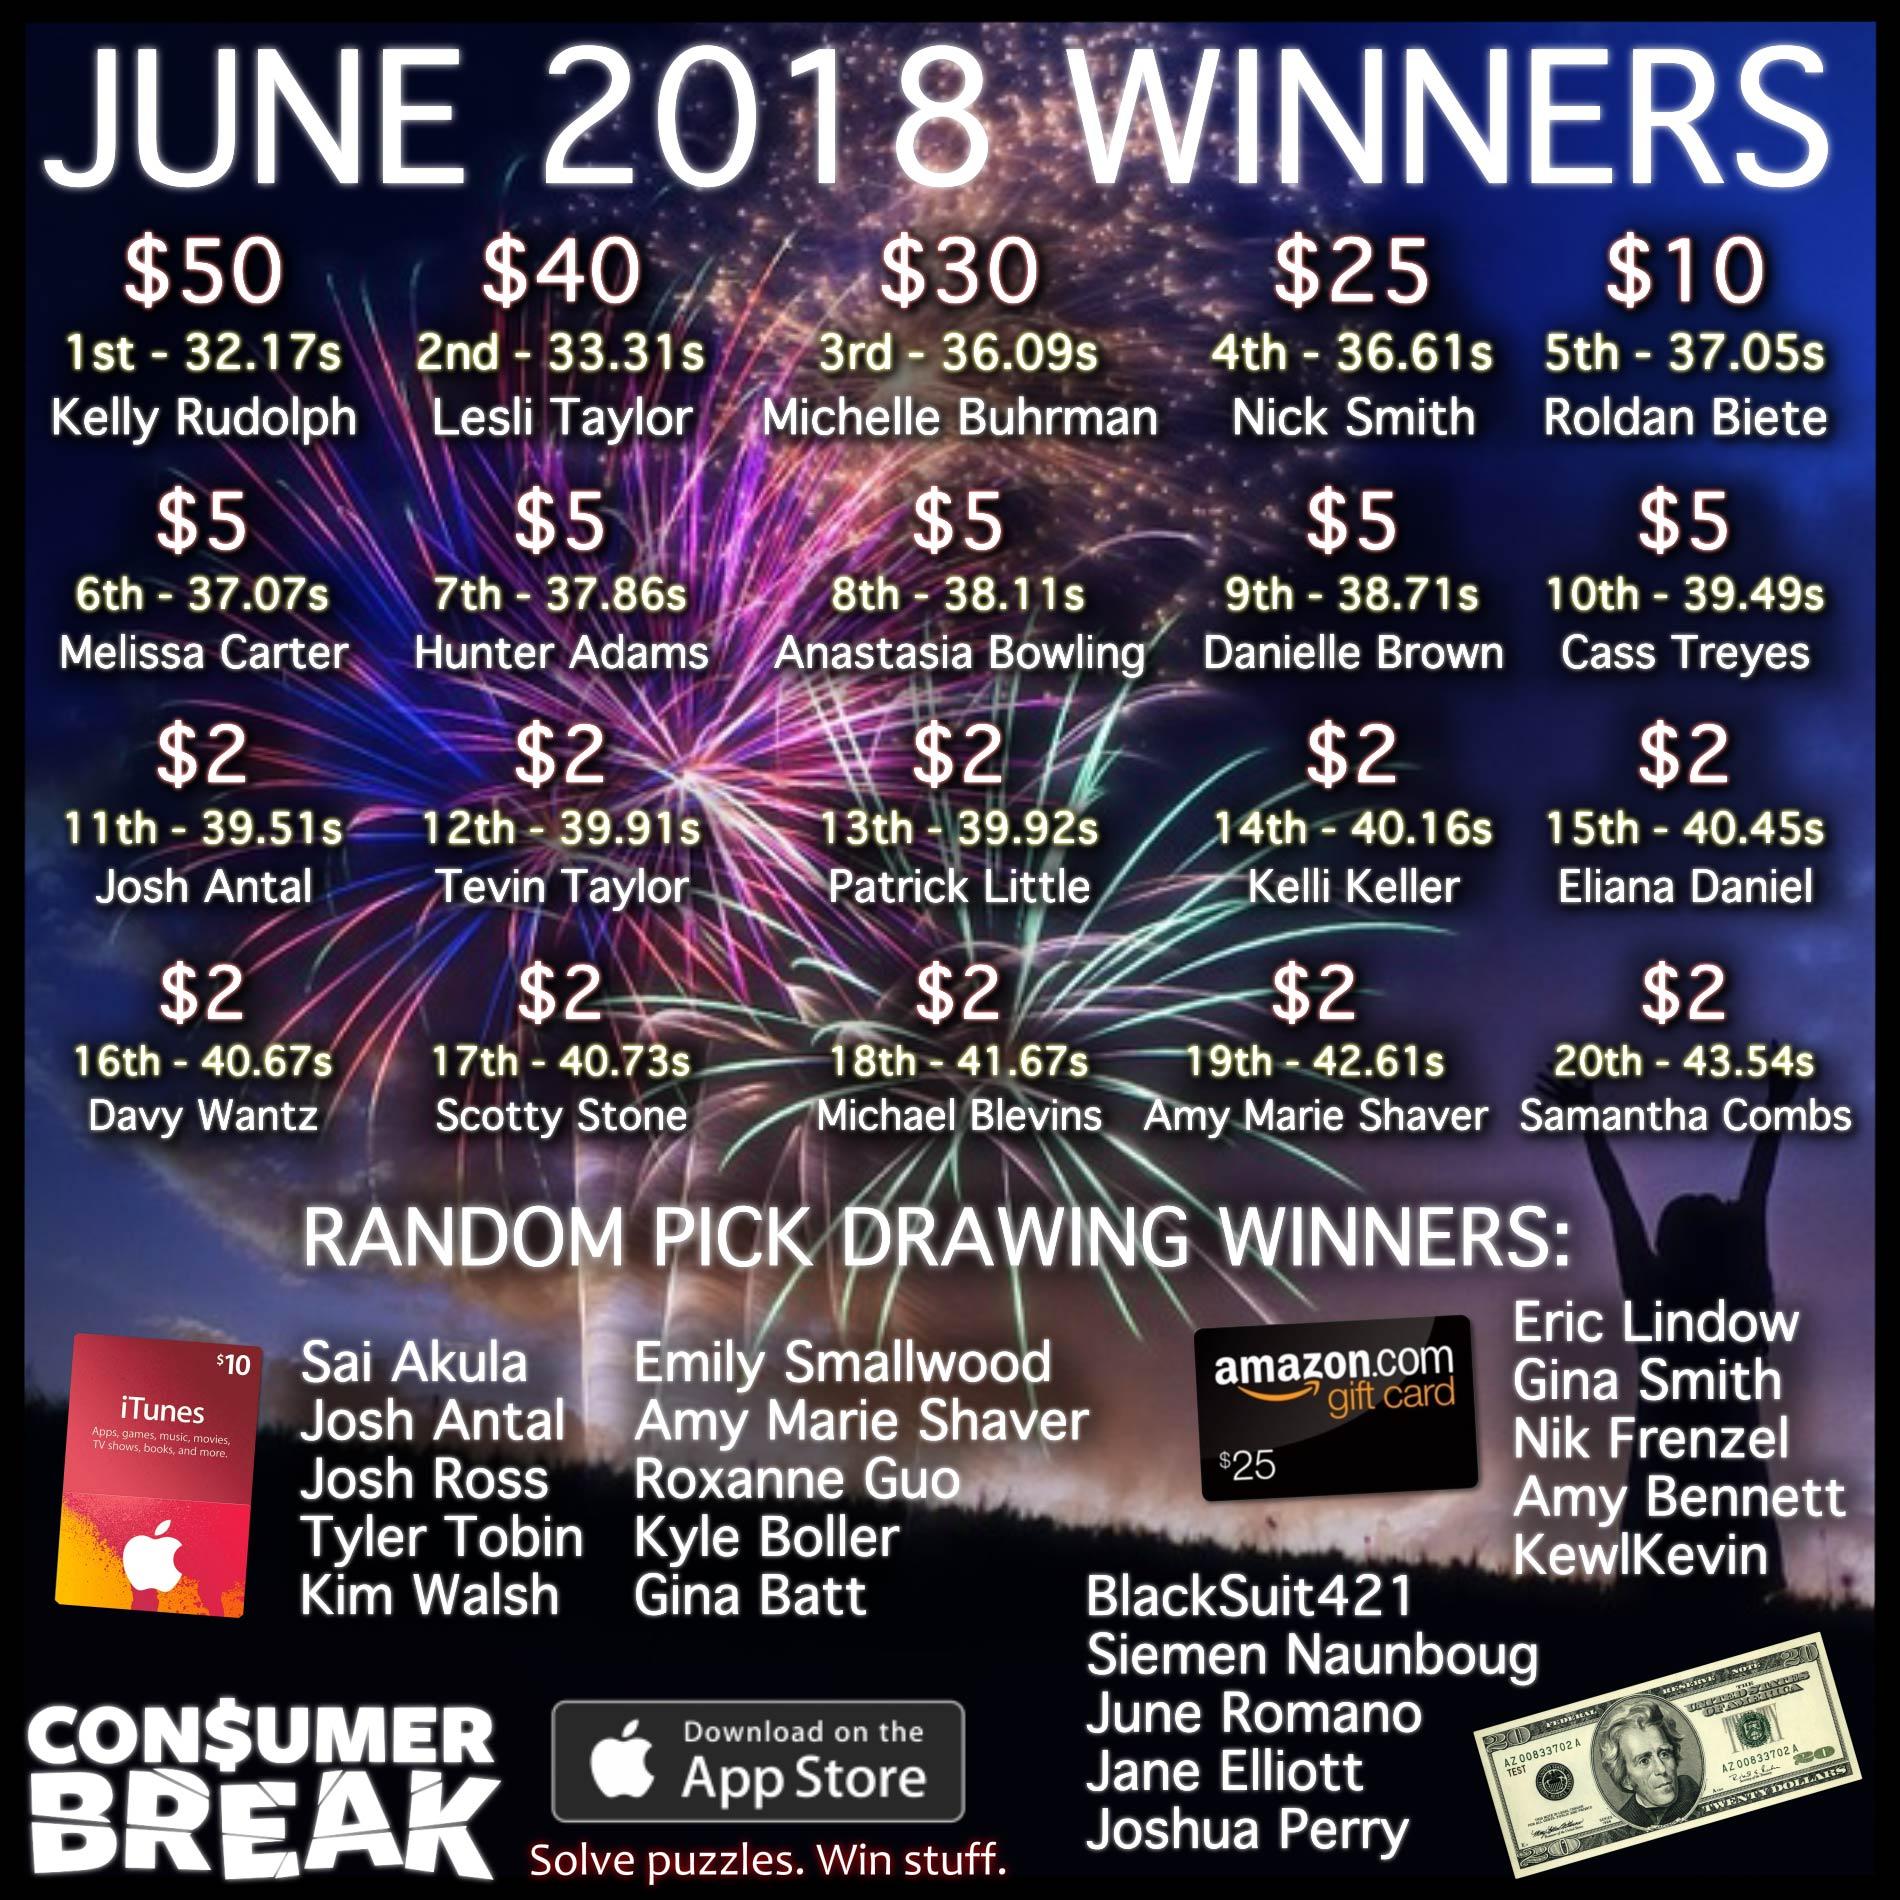 0703 June 2018 winners_00001.jpg